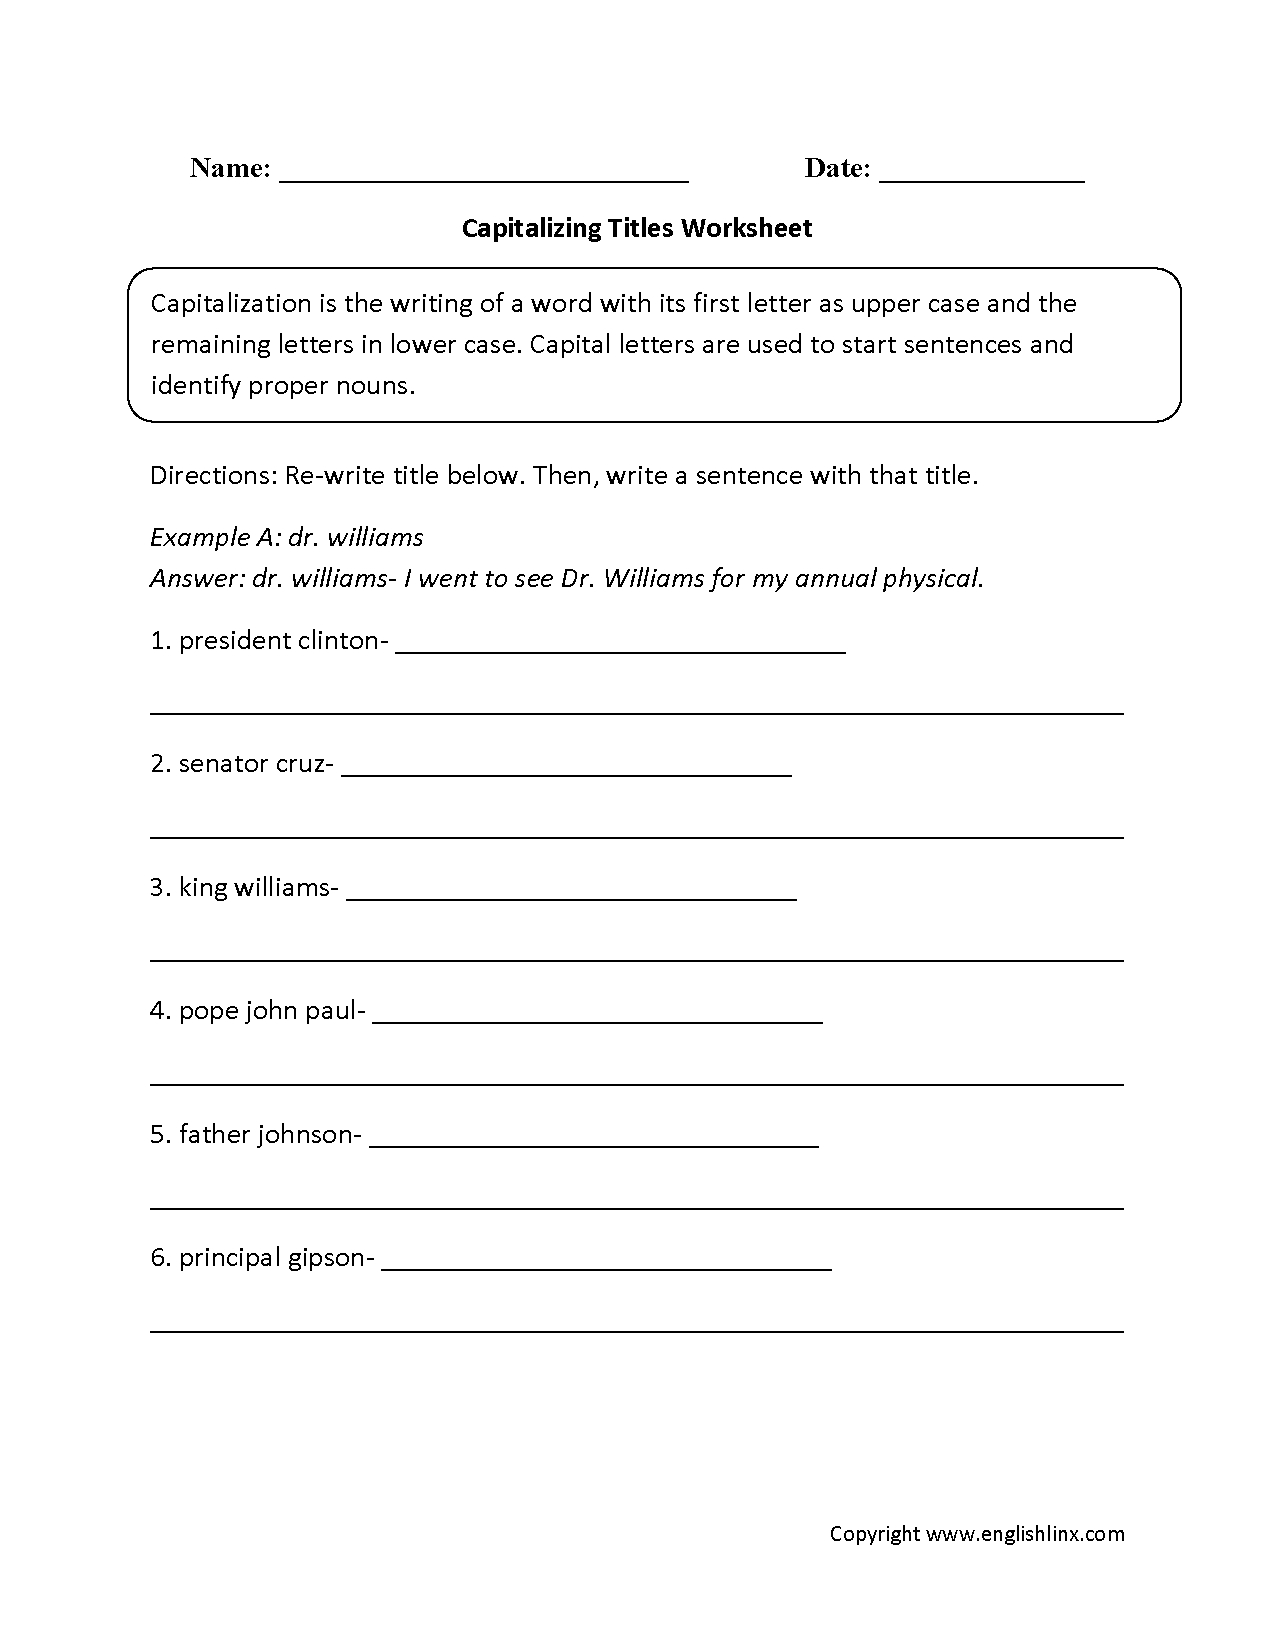 Englishlinx | Capitalization Worksheets - Free Printable Itbs Practice Worksheets